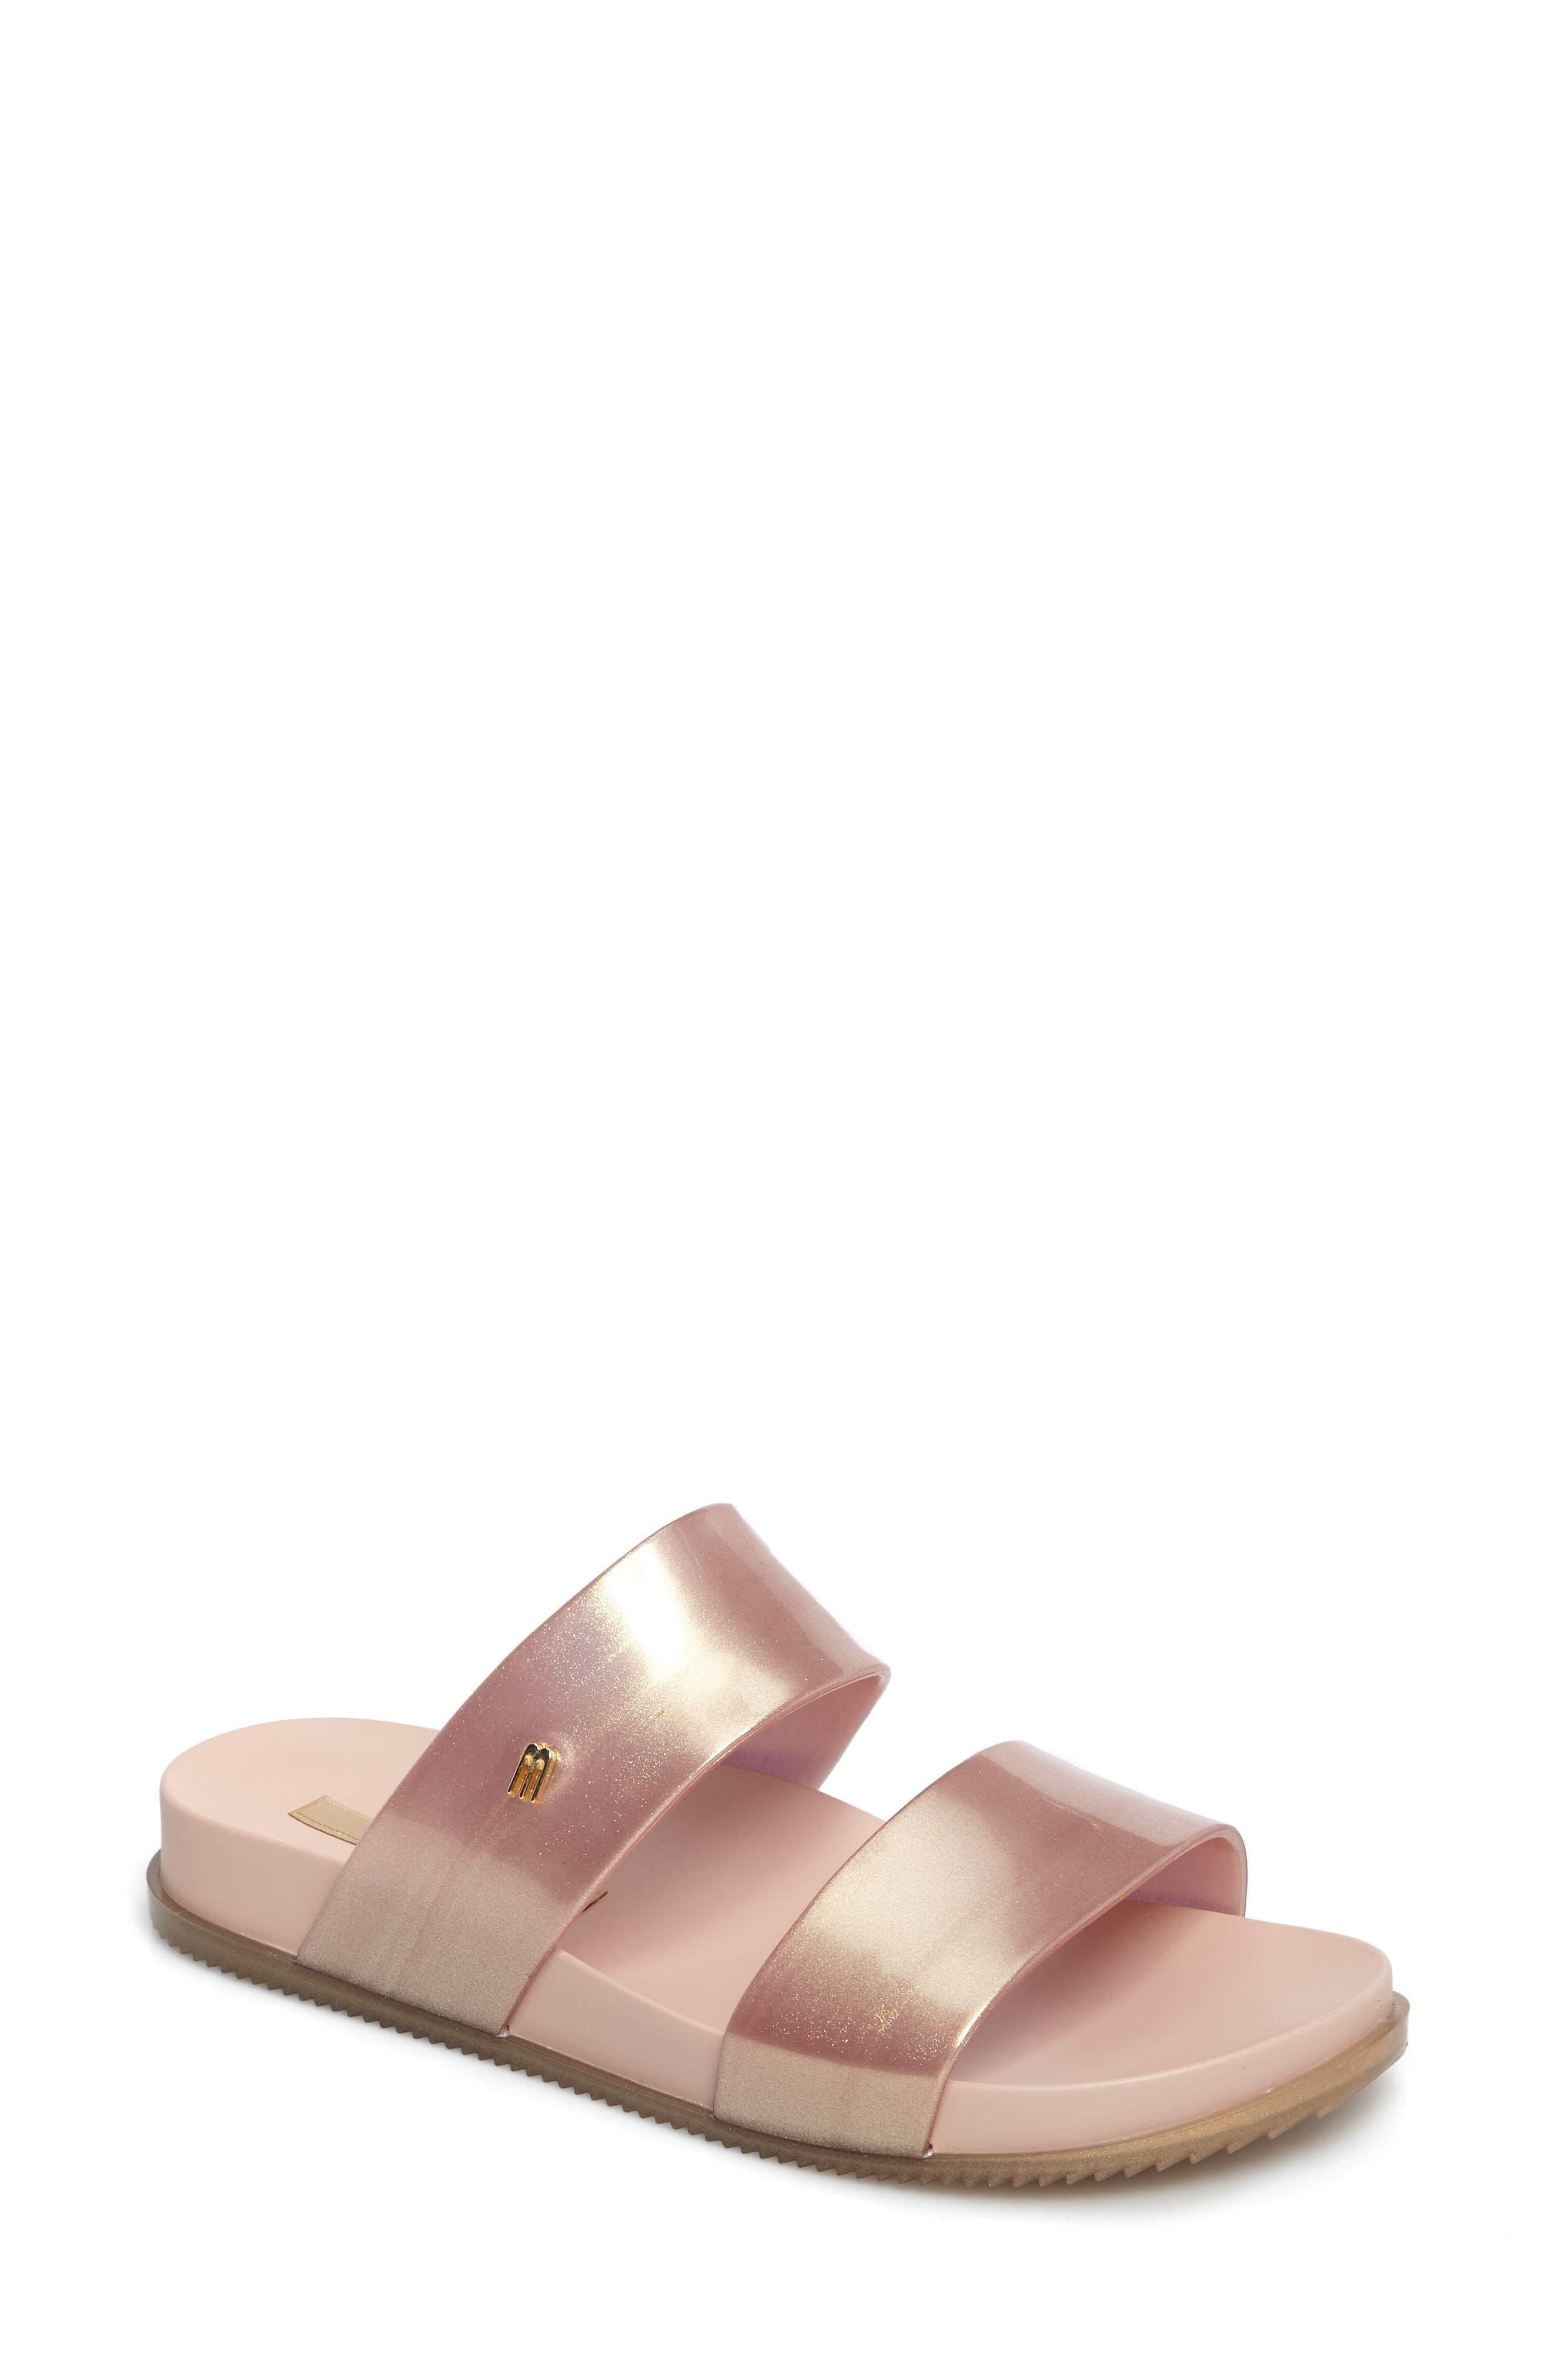 'Cosmic' Sandal,                             Main thumbnail 1, color,                             Metallic Pink